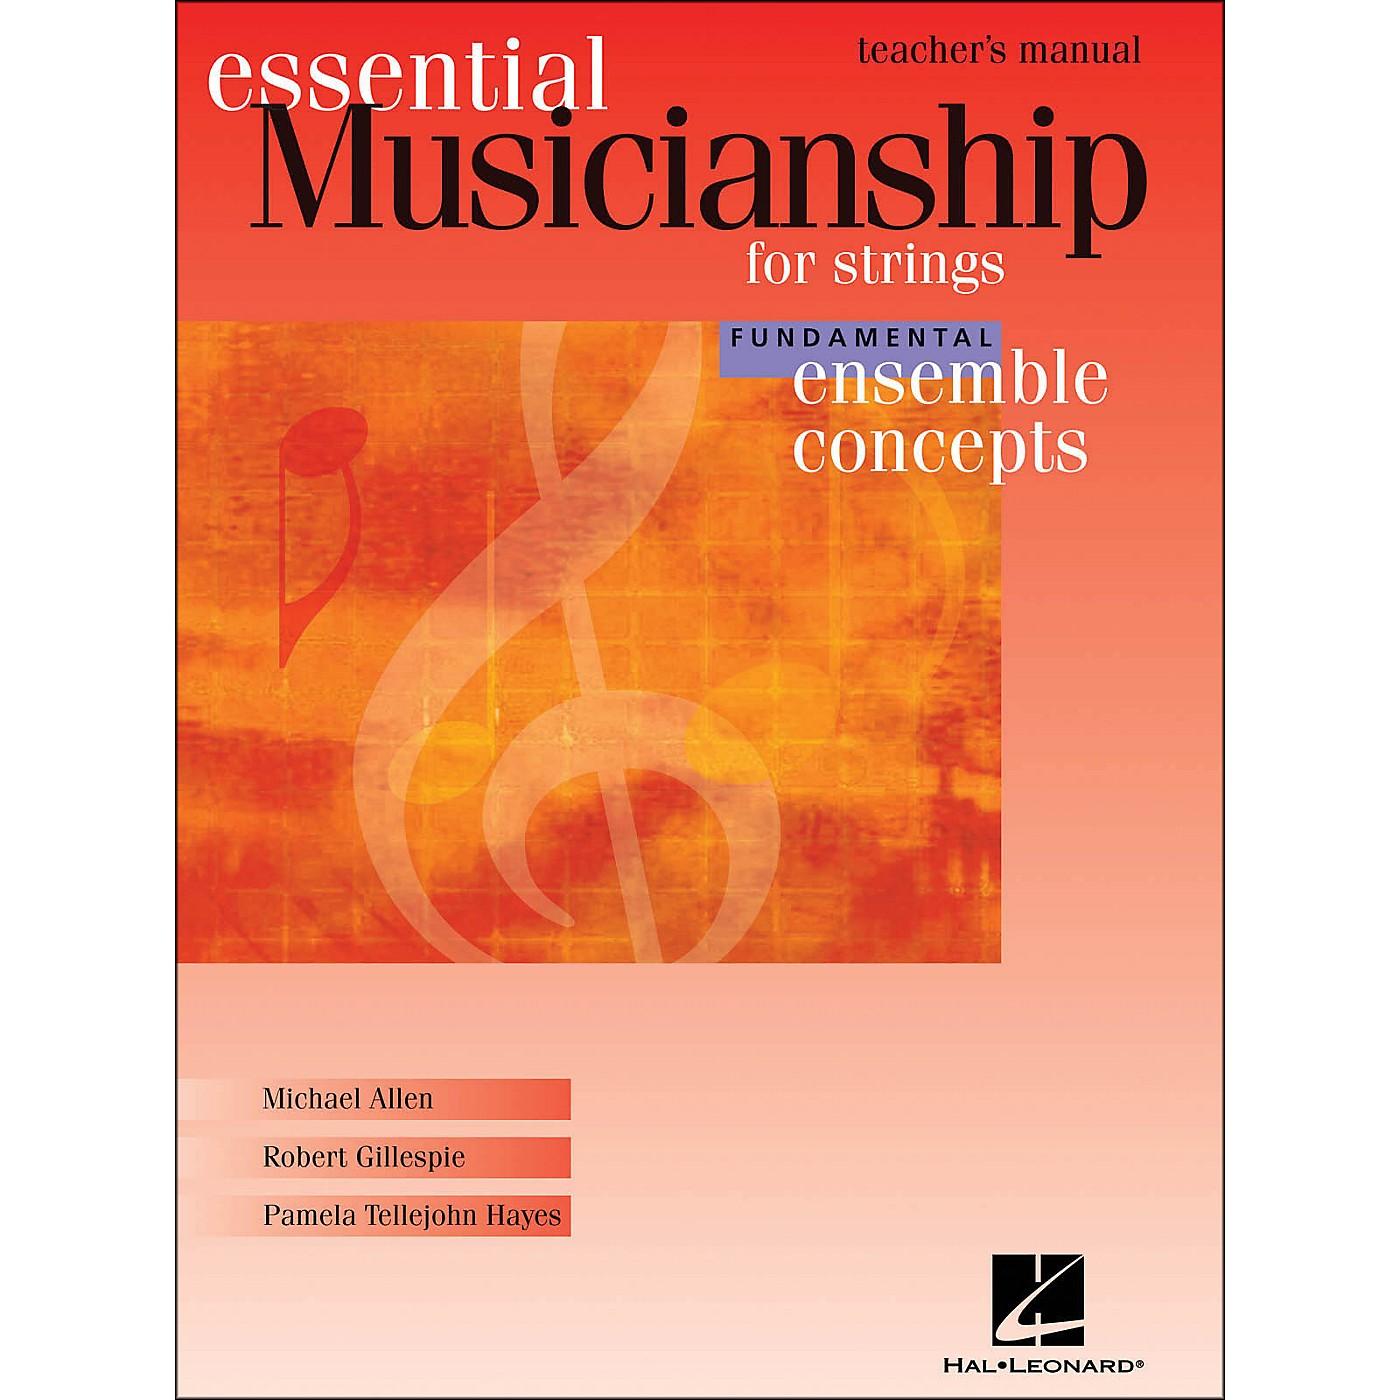 Hal Leonard Essential Musicianship for Strings - Ensemble Concepts Fundamental Teacher's Manual thumbnail